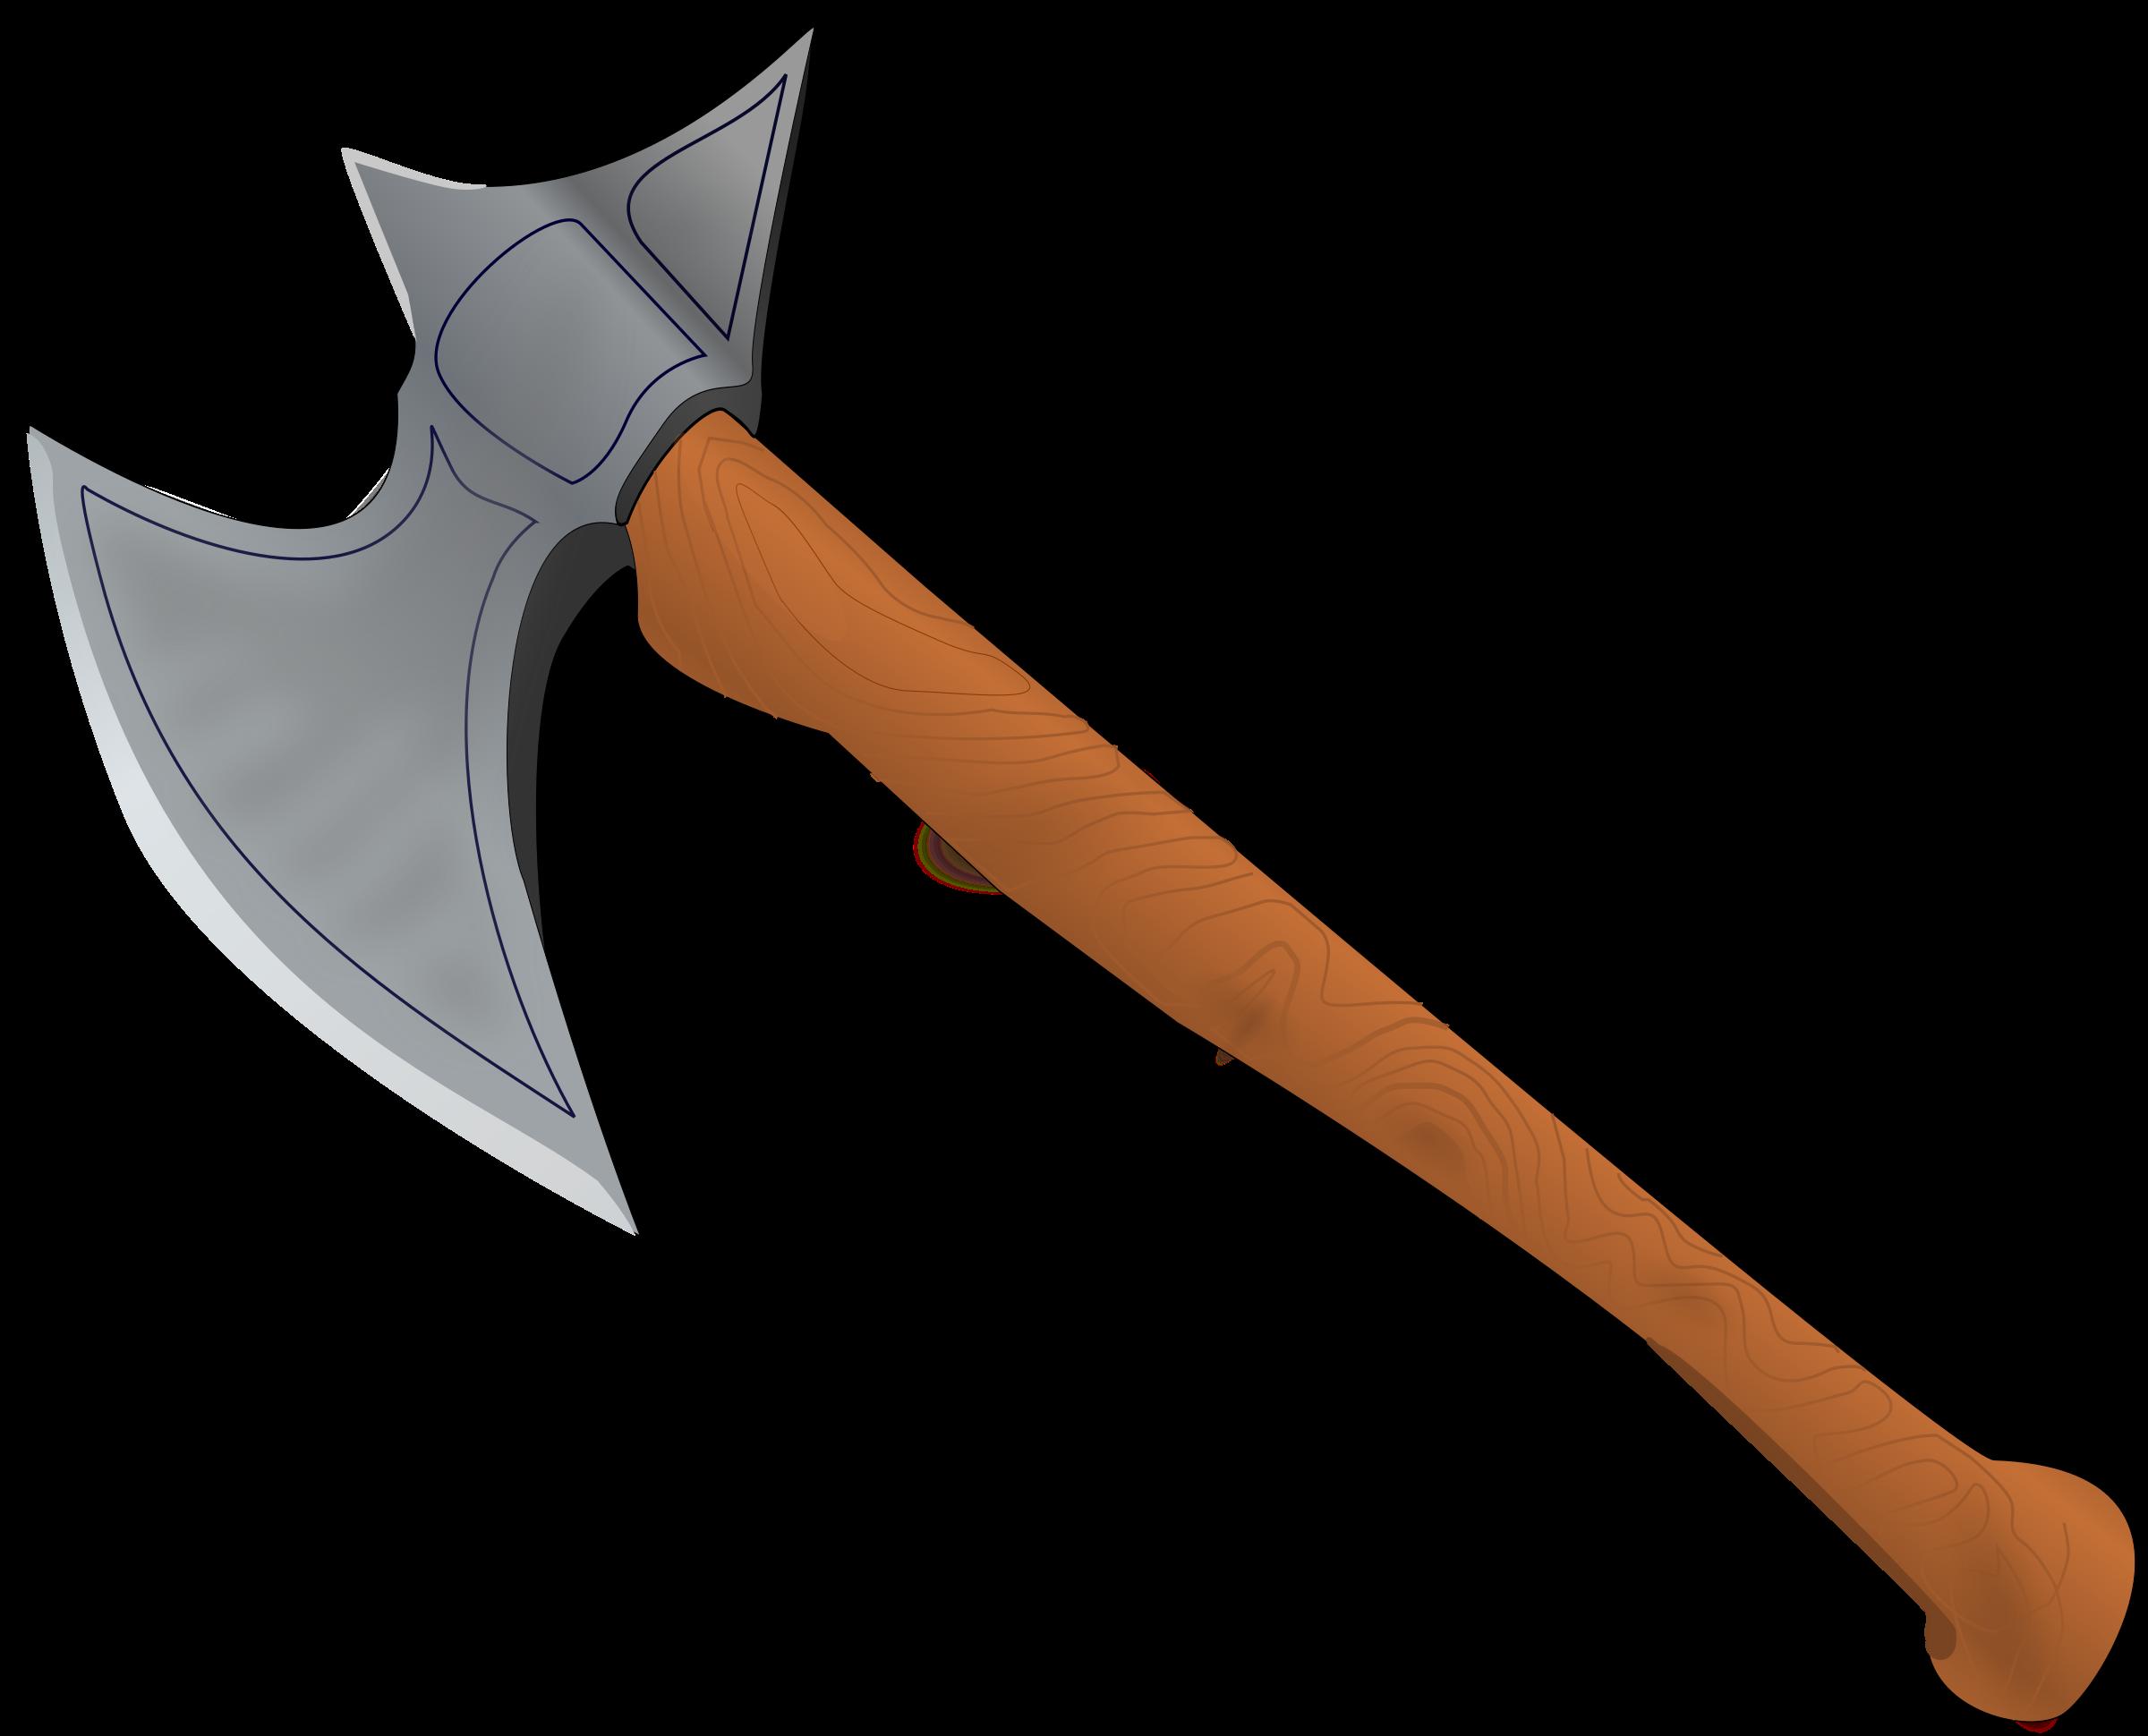 Medieval battle axe clipart.